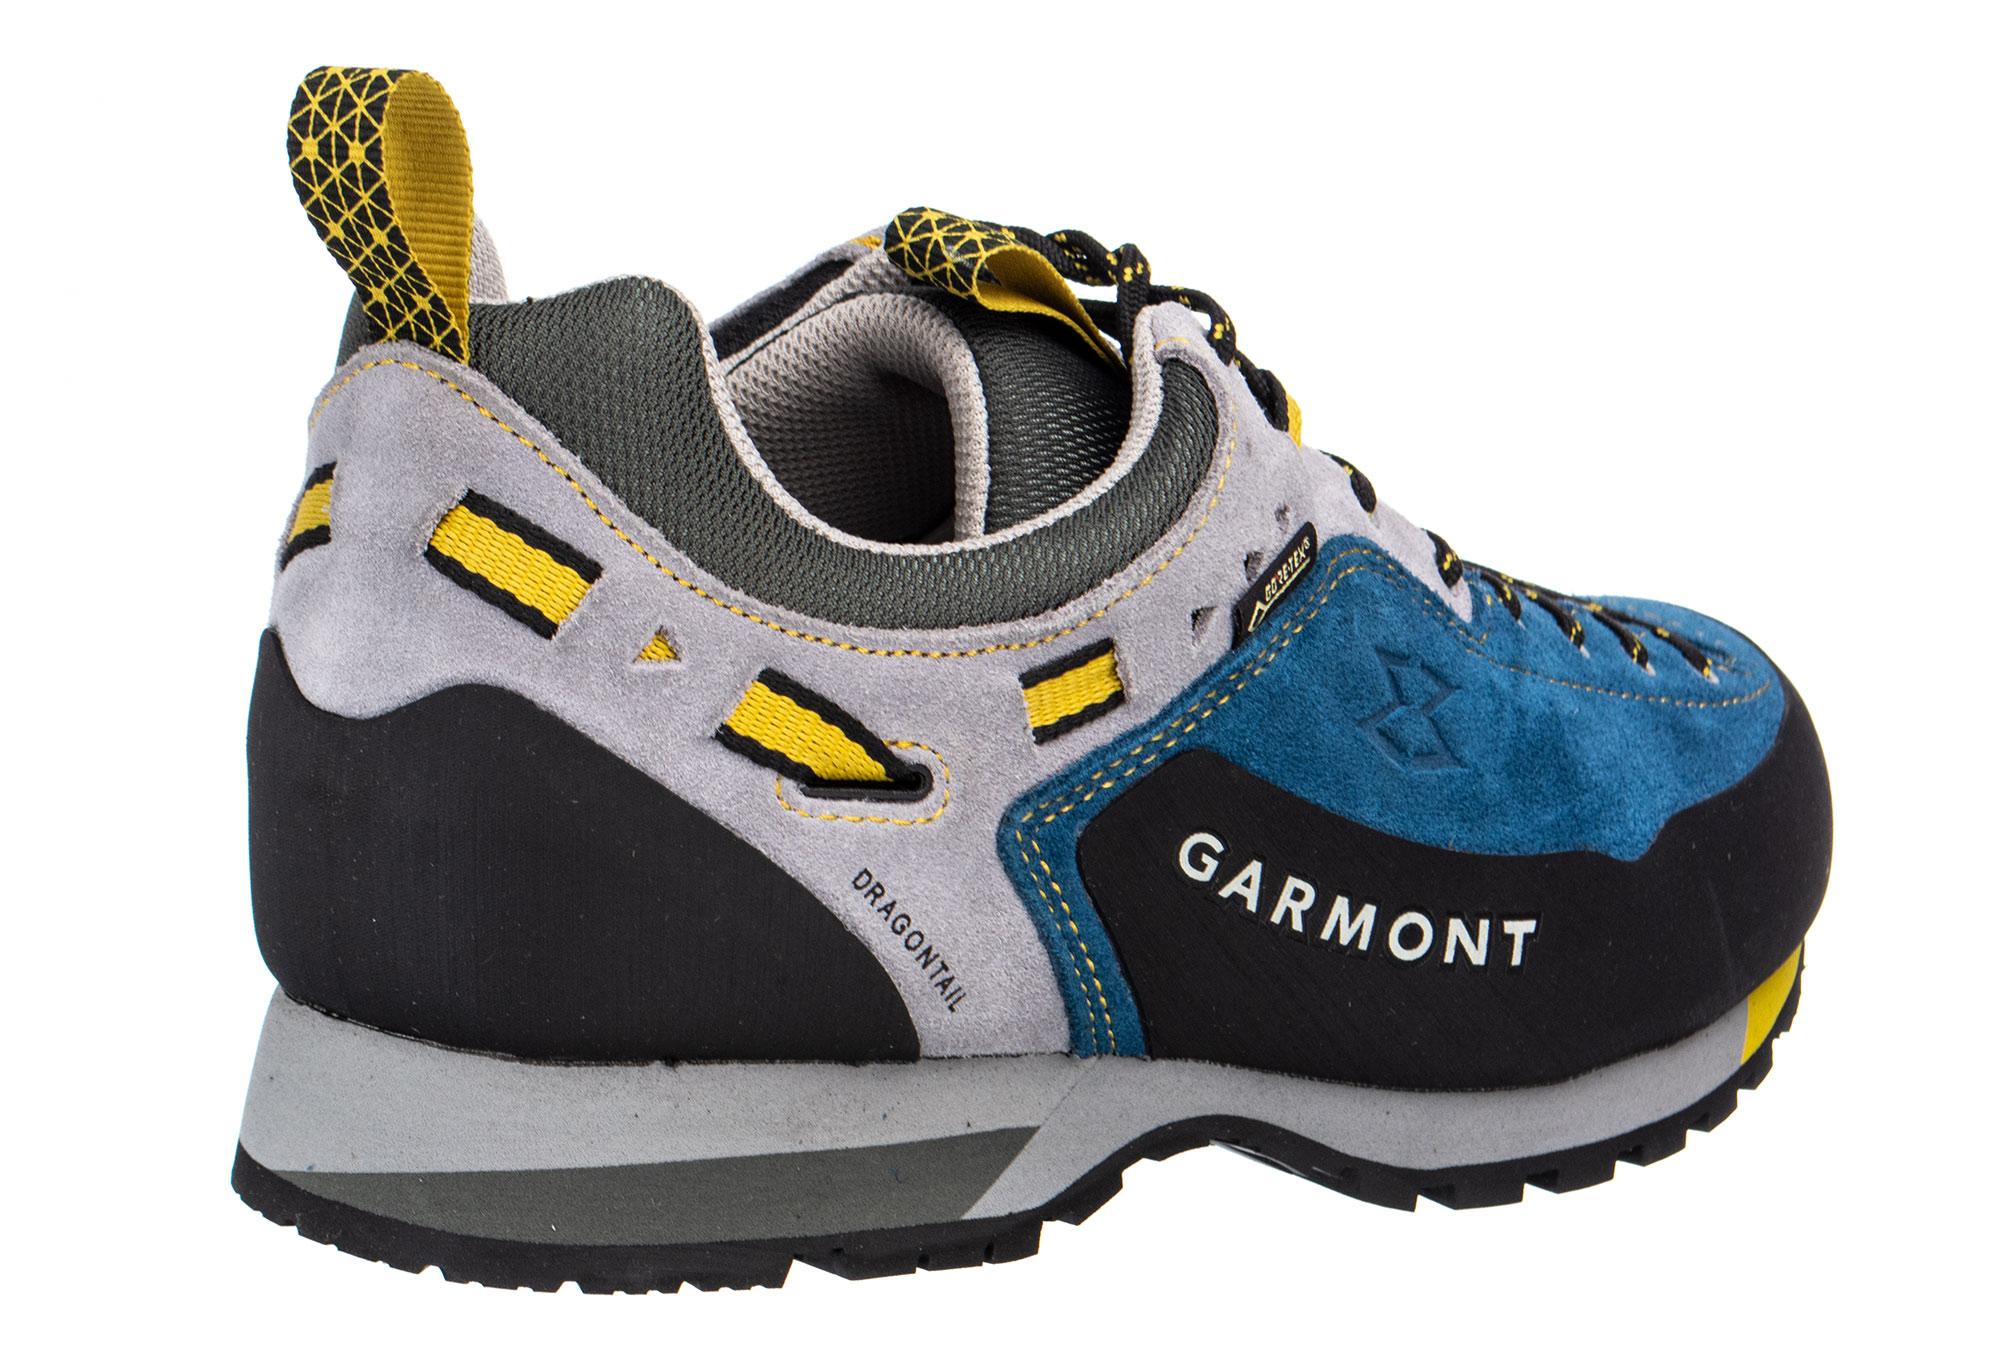 ee5b067dfa35b Scarpe Garmont Dragontail LT GTX Blu Grigio